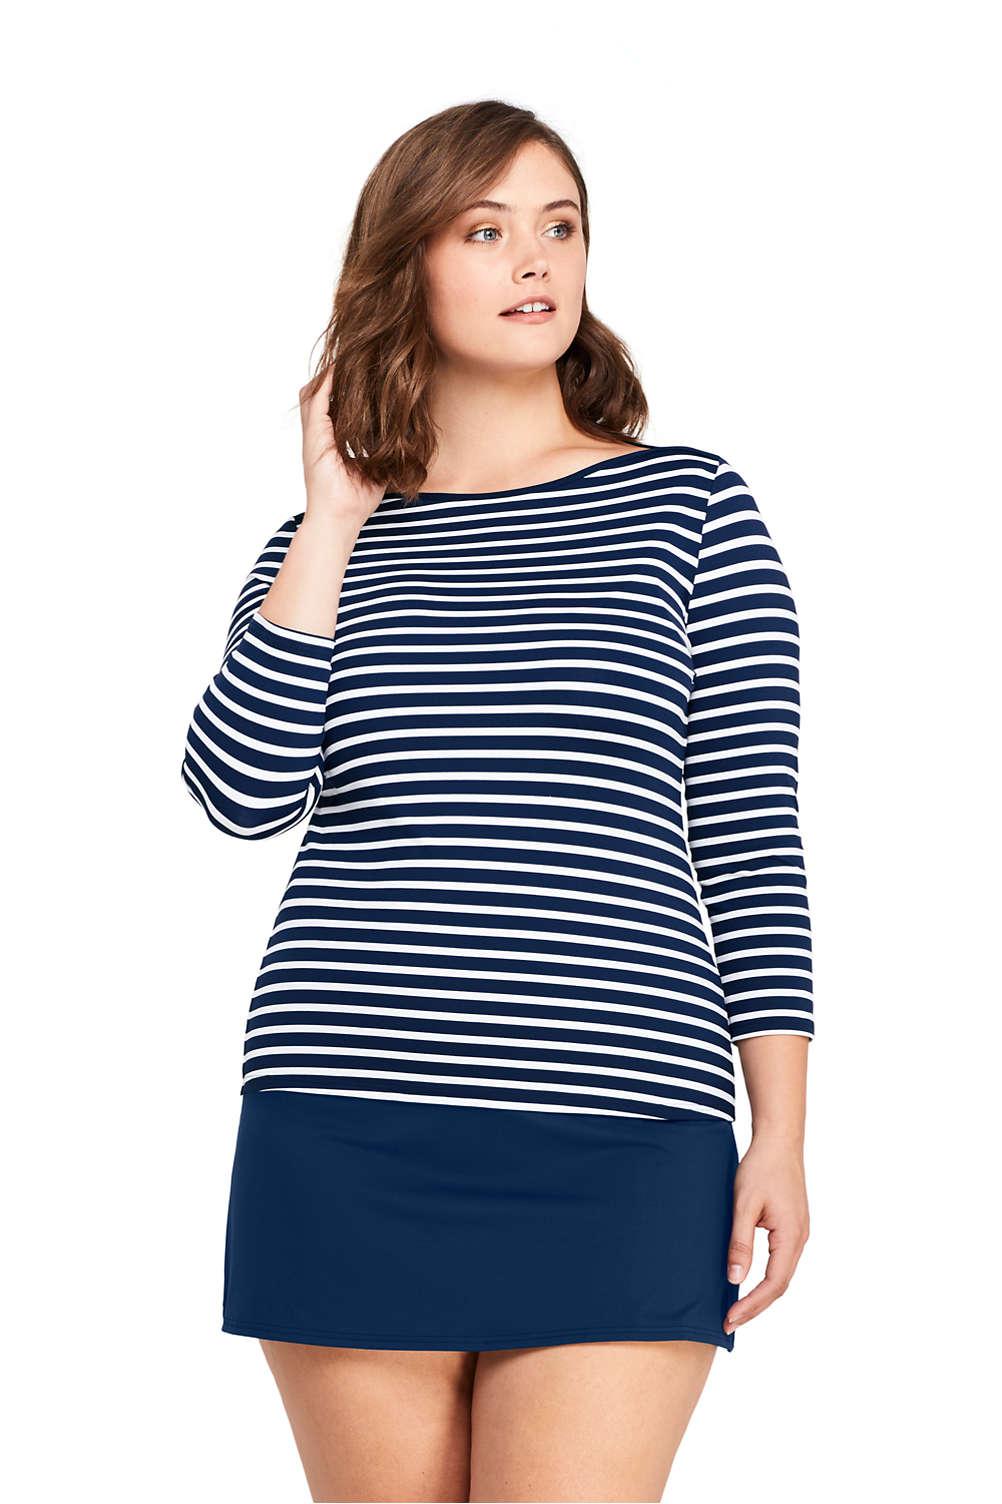 95eea71e981 Women S Plus Size Swim Cover Up Boatneck Tee Rash Guard Print